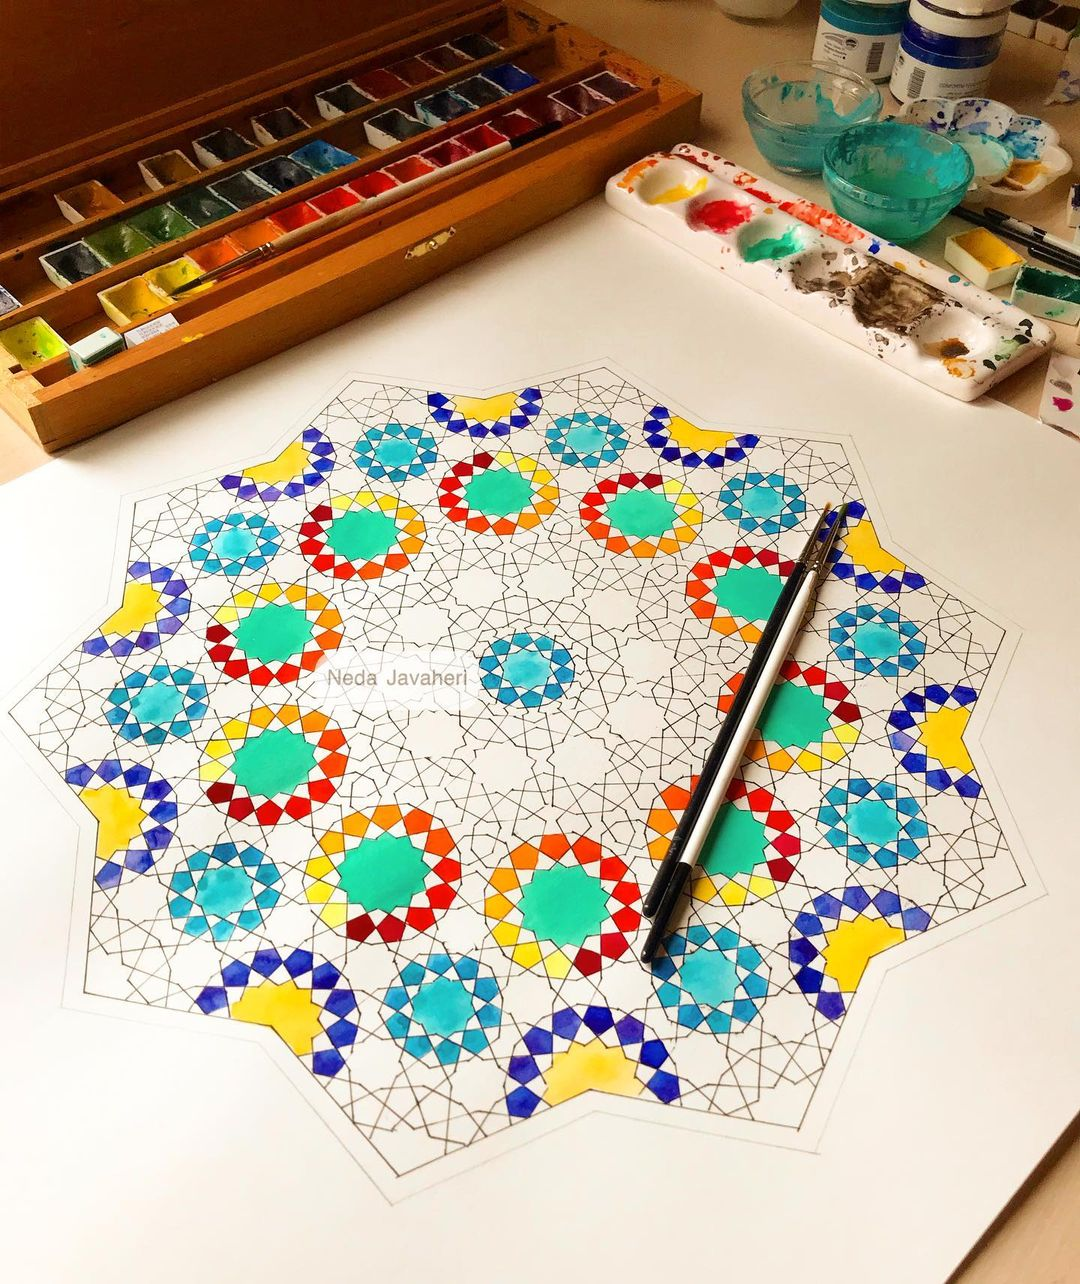 Karya Kaligrafi  در حال اجرا گره ترکیبی نه، ده، یازده، دوازده و سیزده در زمینه ی شمسه ده طرا…- Ne Javaher